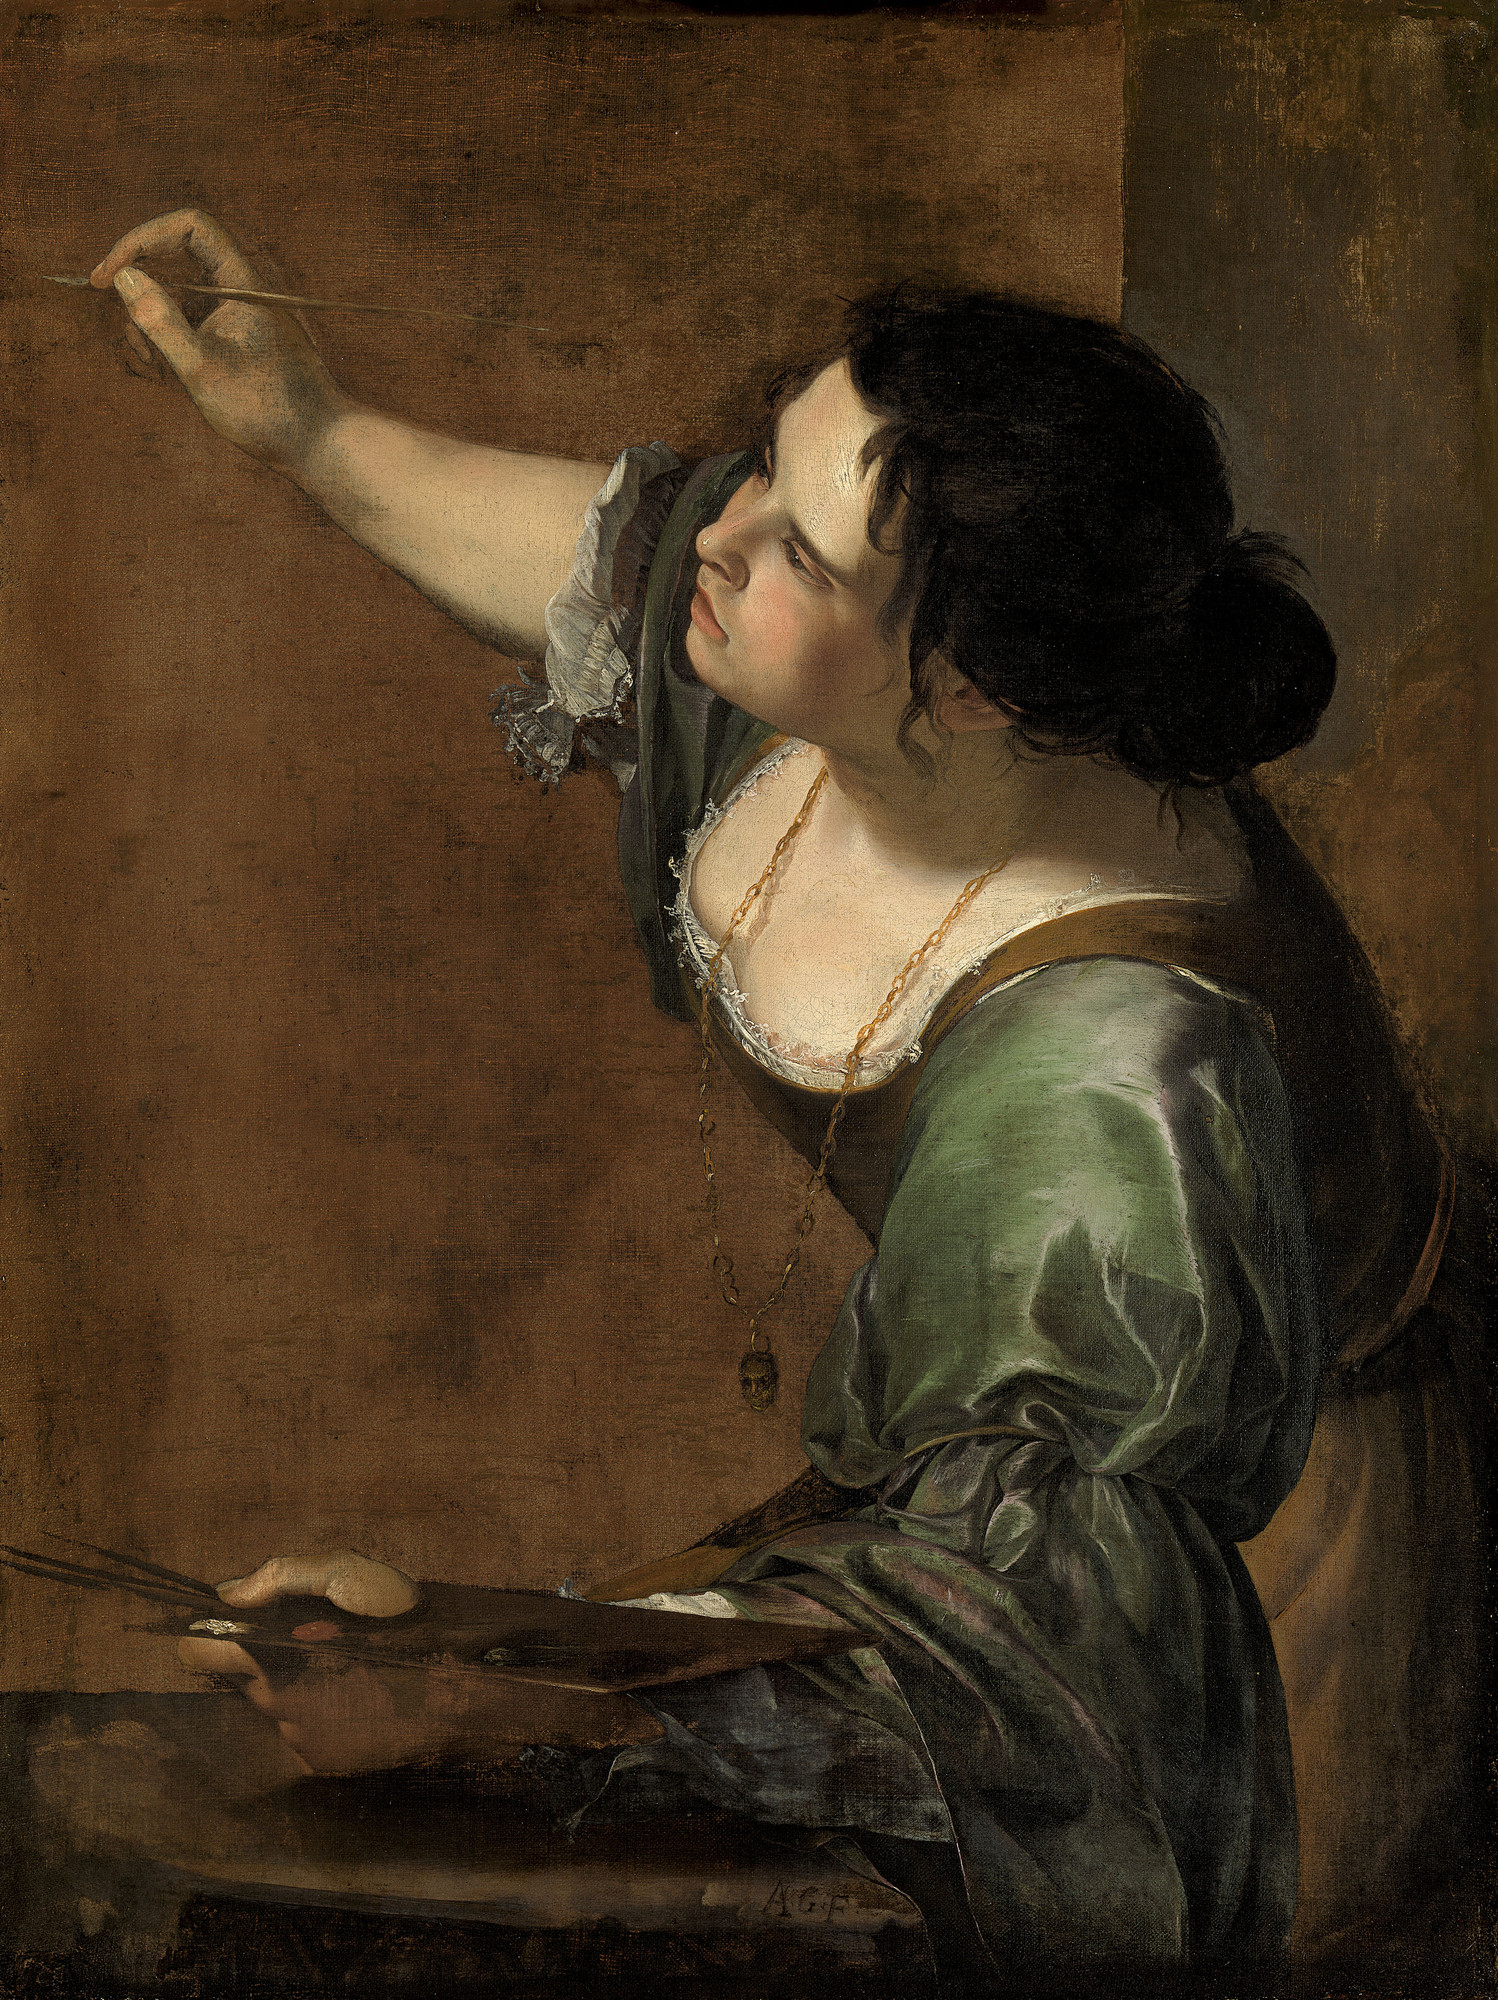 https://upload.wikimedia.org/wikipedia/commons/0/05/Self-portrait_as_the_Allegory_of_Painting_(La_Pittura)_-_Artemisia_Gentileschi.jpg